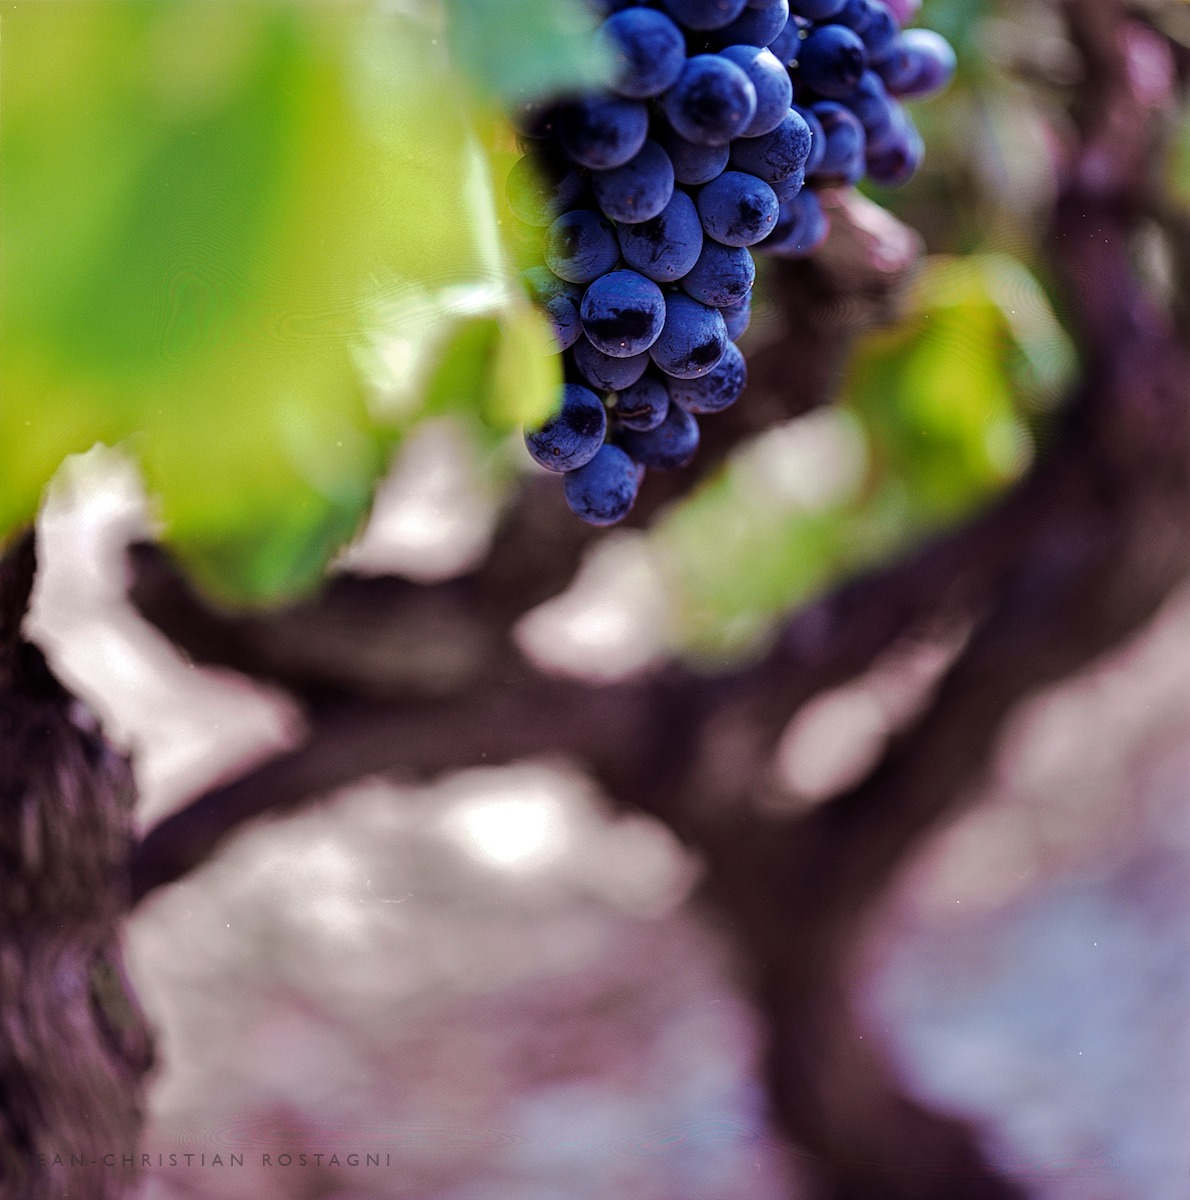 grape raisin cep